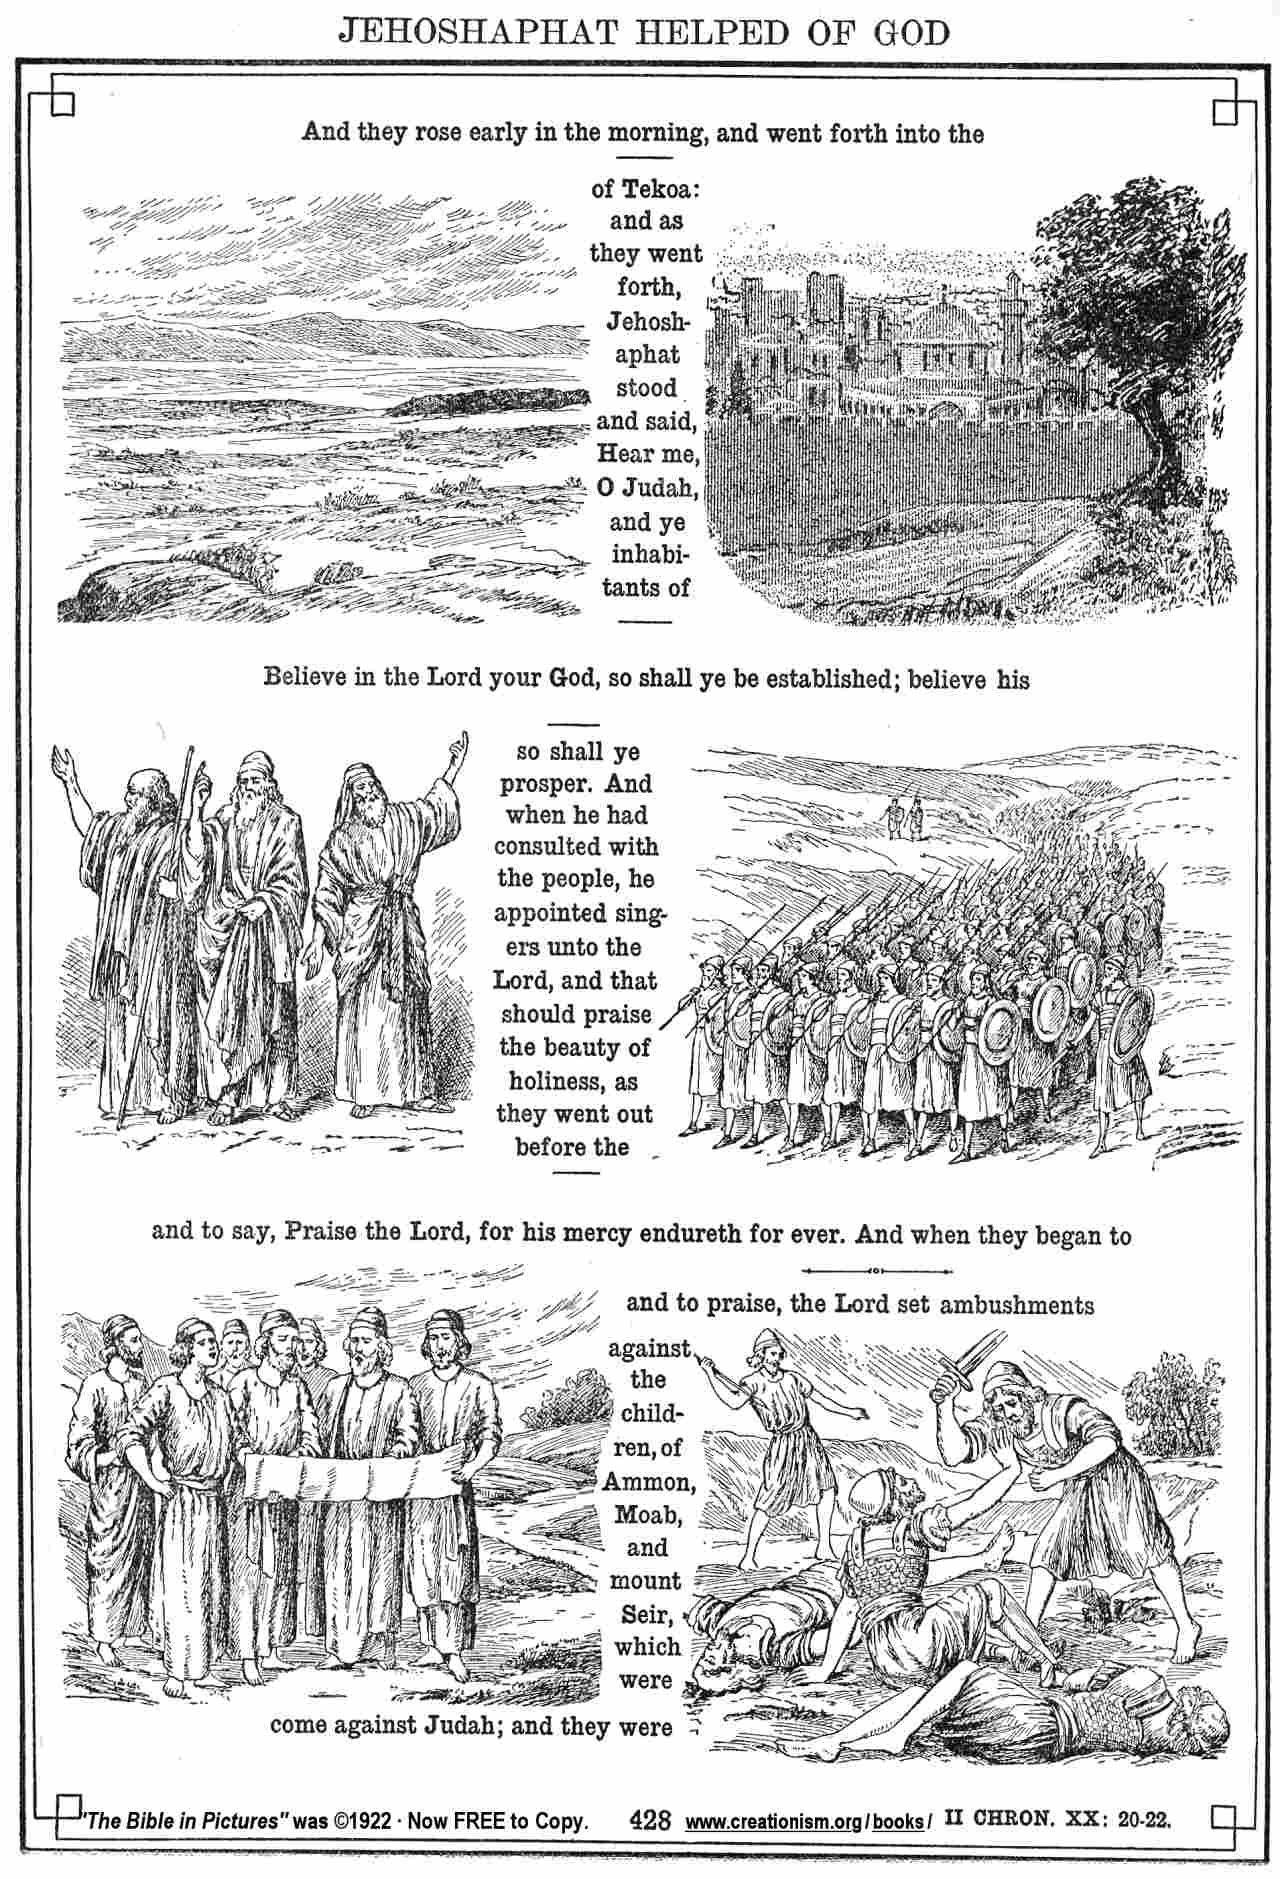 Ngjamesbibleonline Bible Image Hires